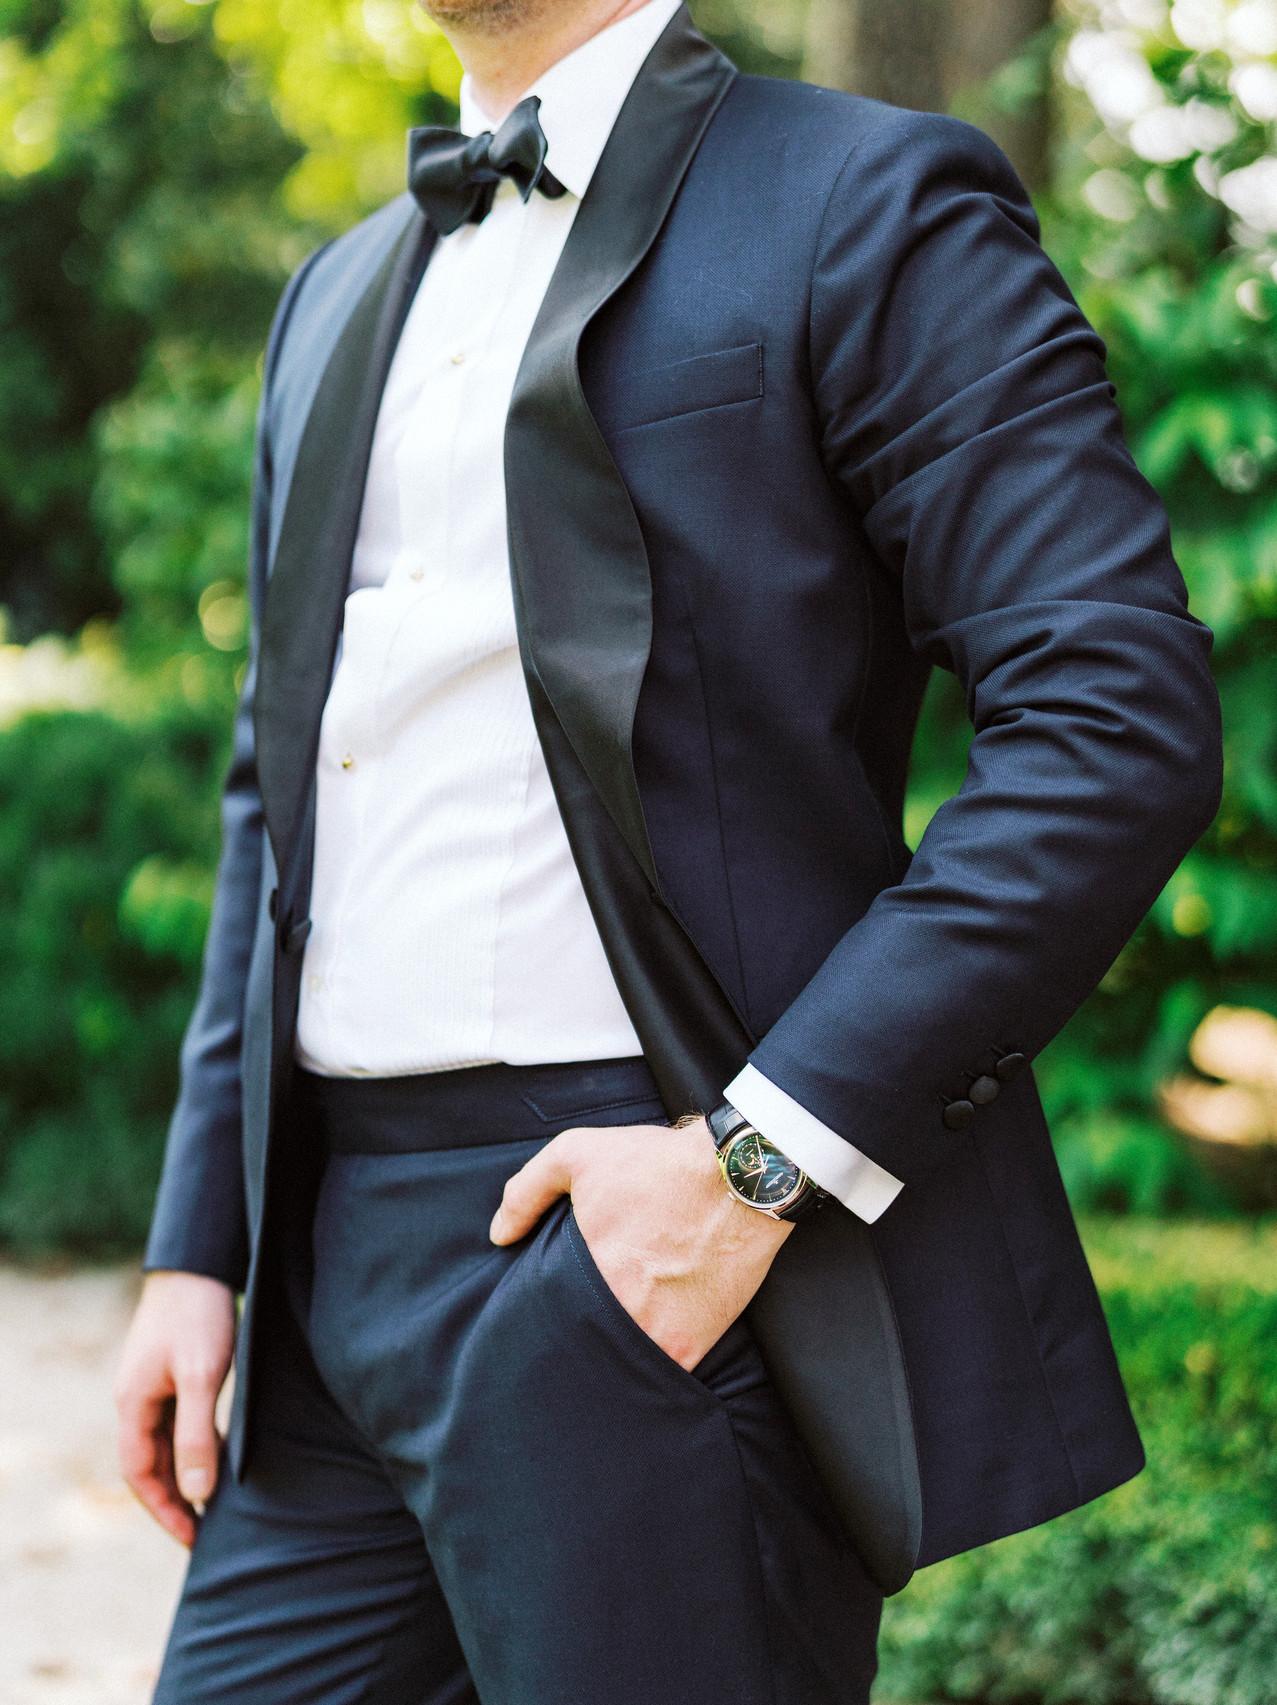 SoHo Event Design wedding planner Duke Mansion wedding custom tuxedo north carolina wedding planner